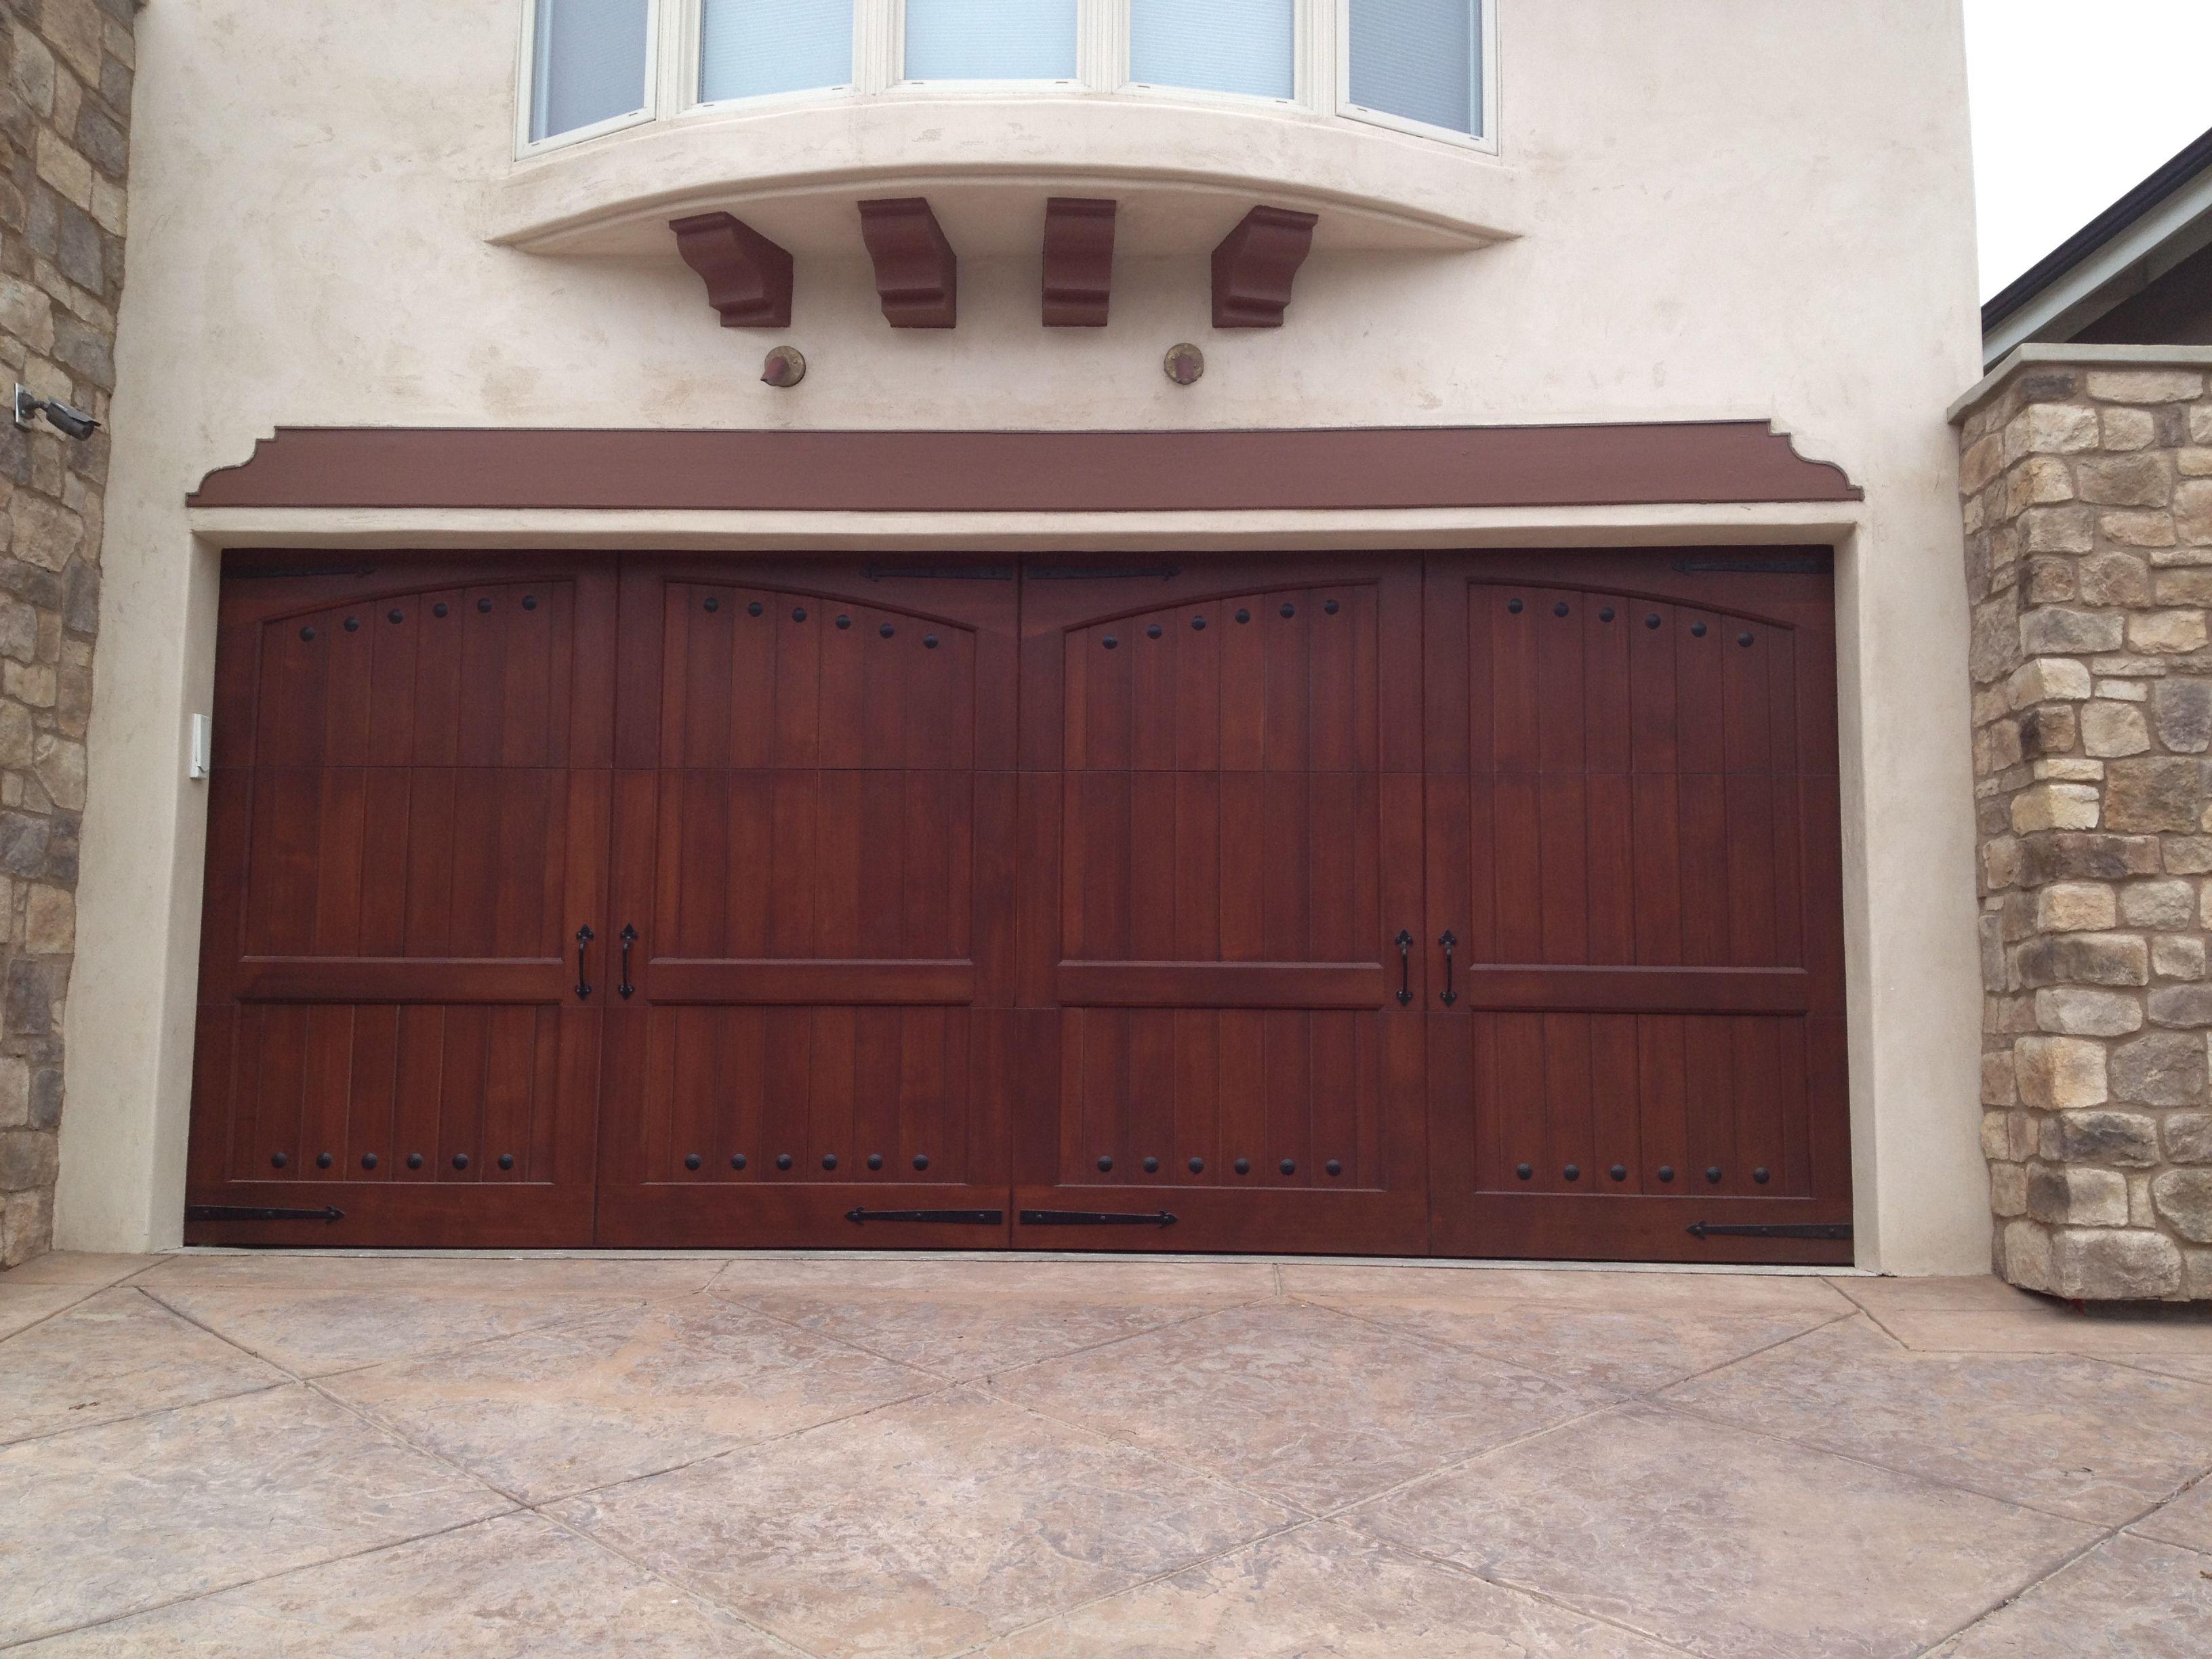 Beautiful Carriage House Non-Traditional Woodlike Custom Garage Door.  Los Angeles, CA Photo Credit: Agi Dyer